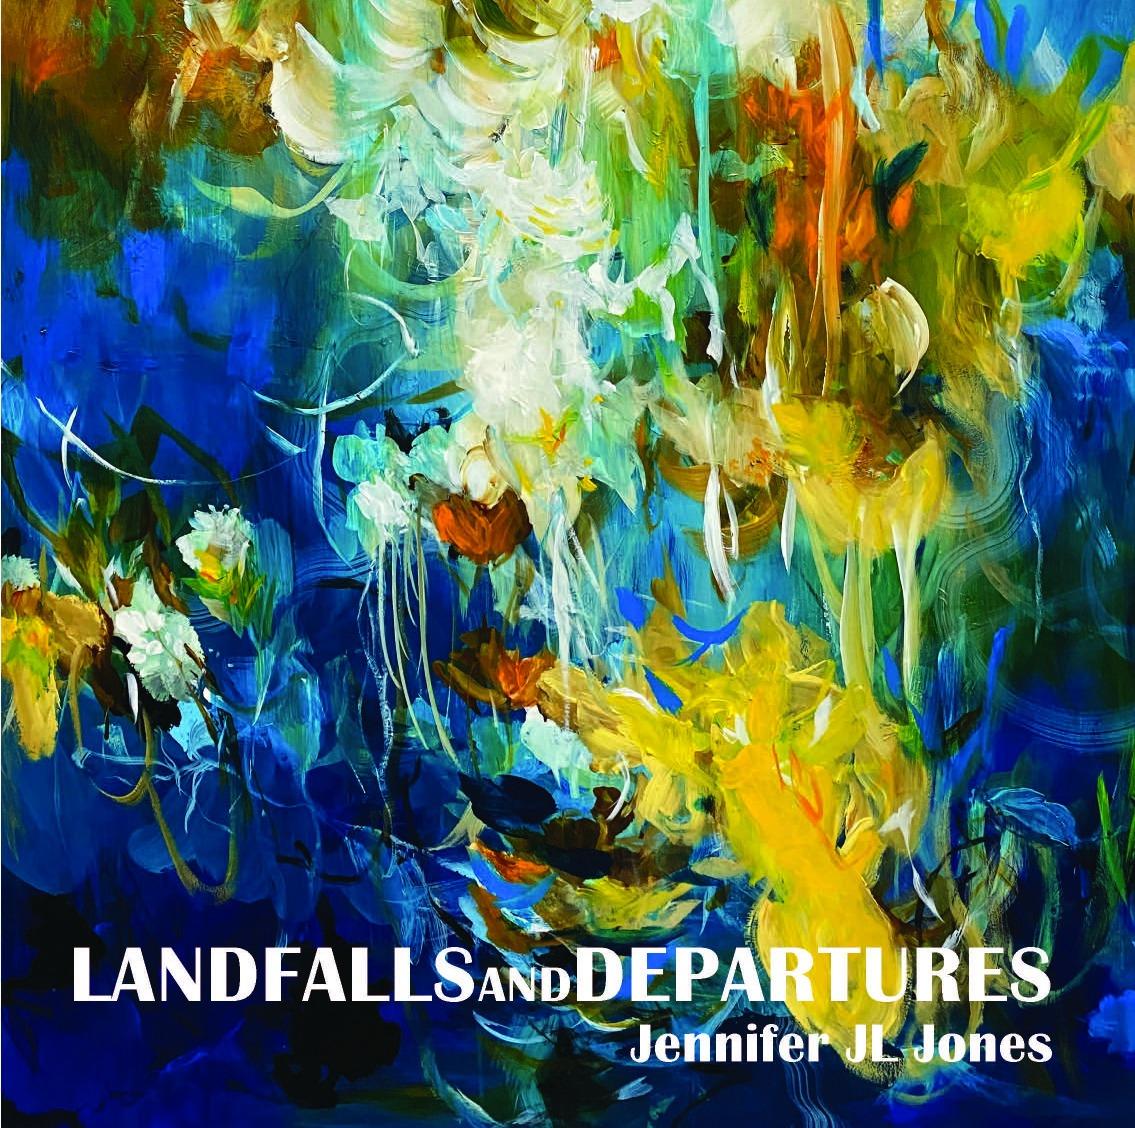 Landfalls and Departures